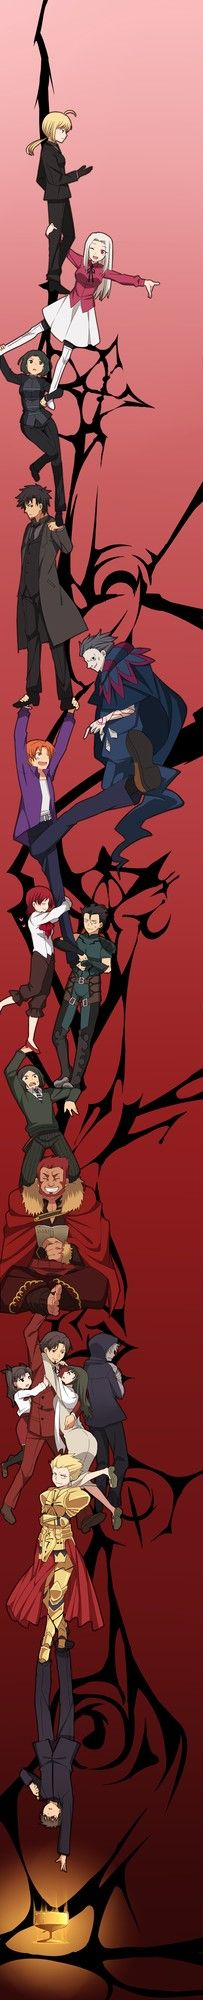 Fate/zero x Durarara!! This made me so happy!